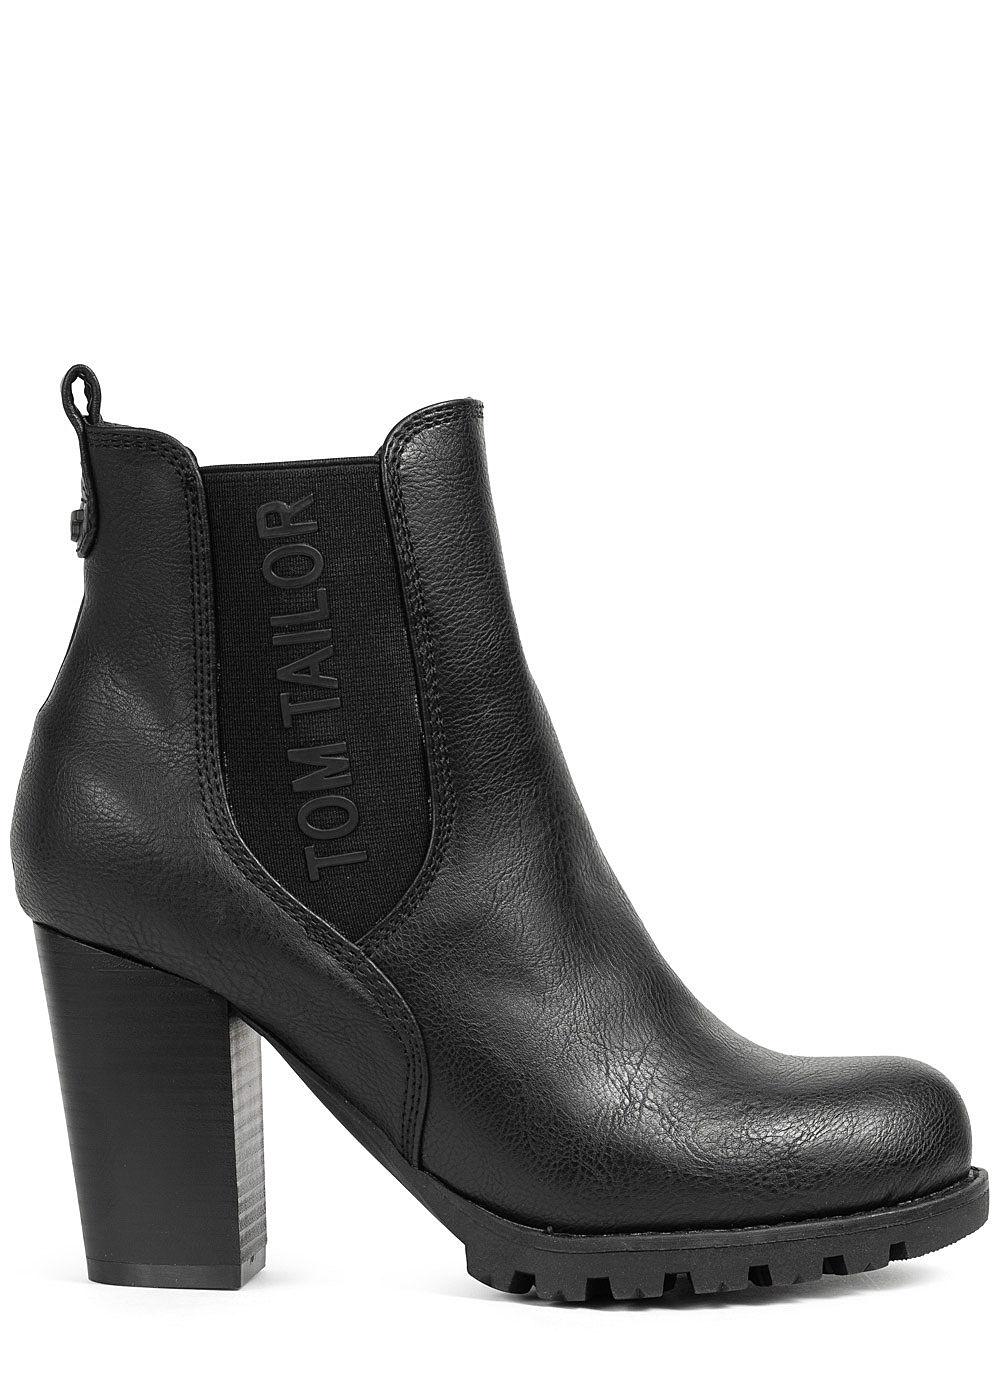 Tom Tailor Damen Schuh Boots Stiefelette Absatz 8,5cm